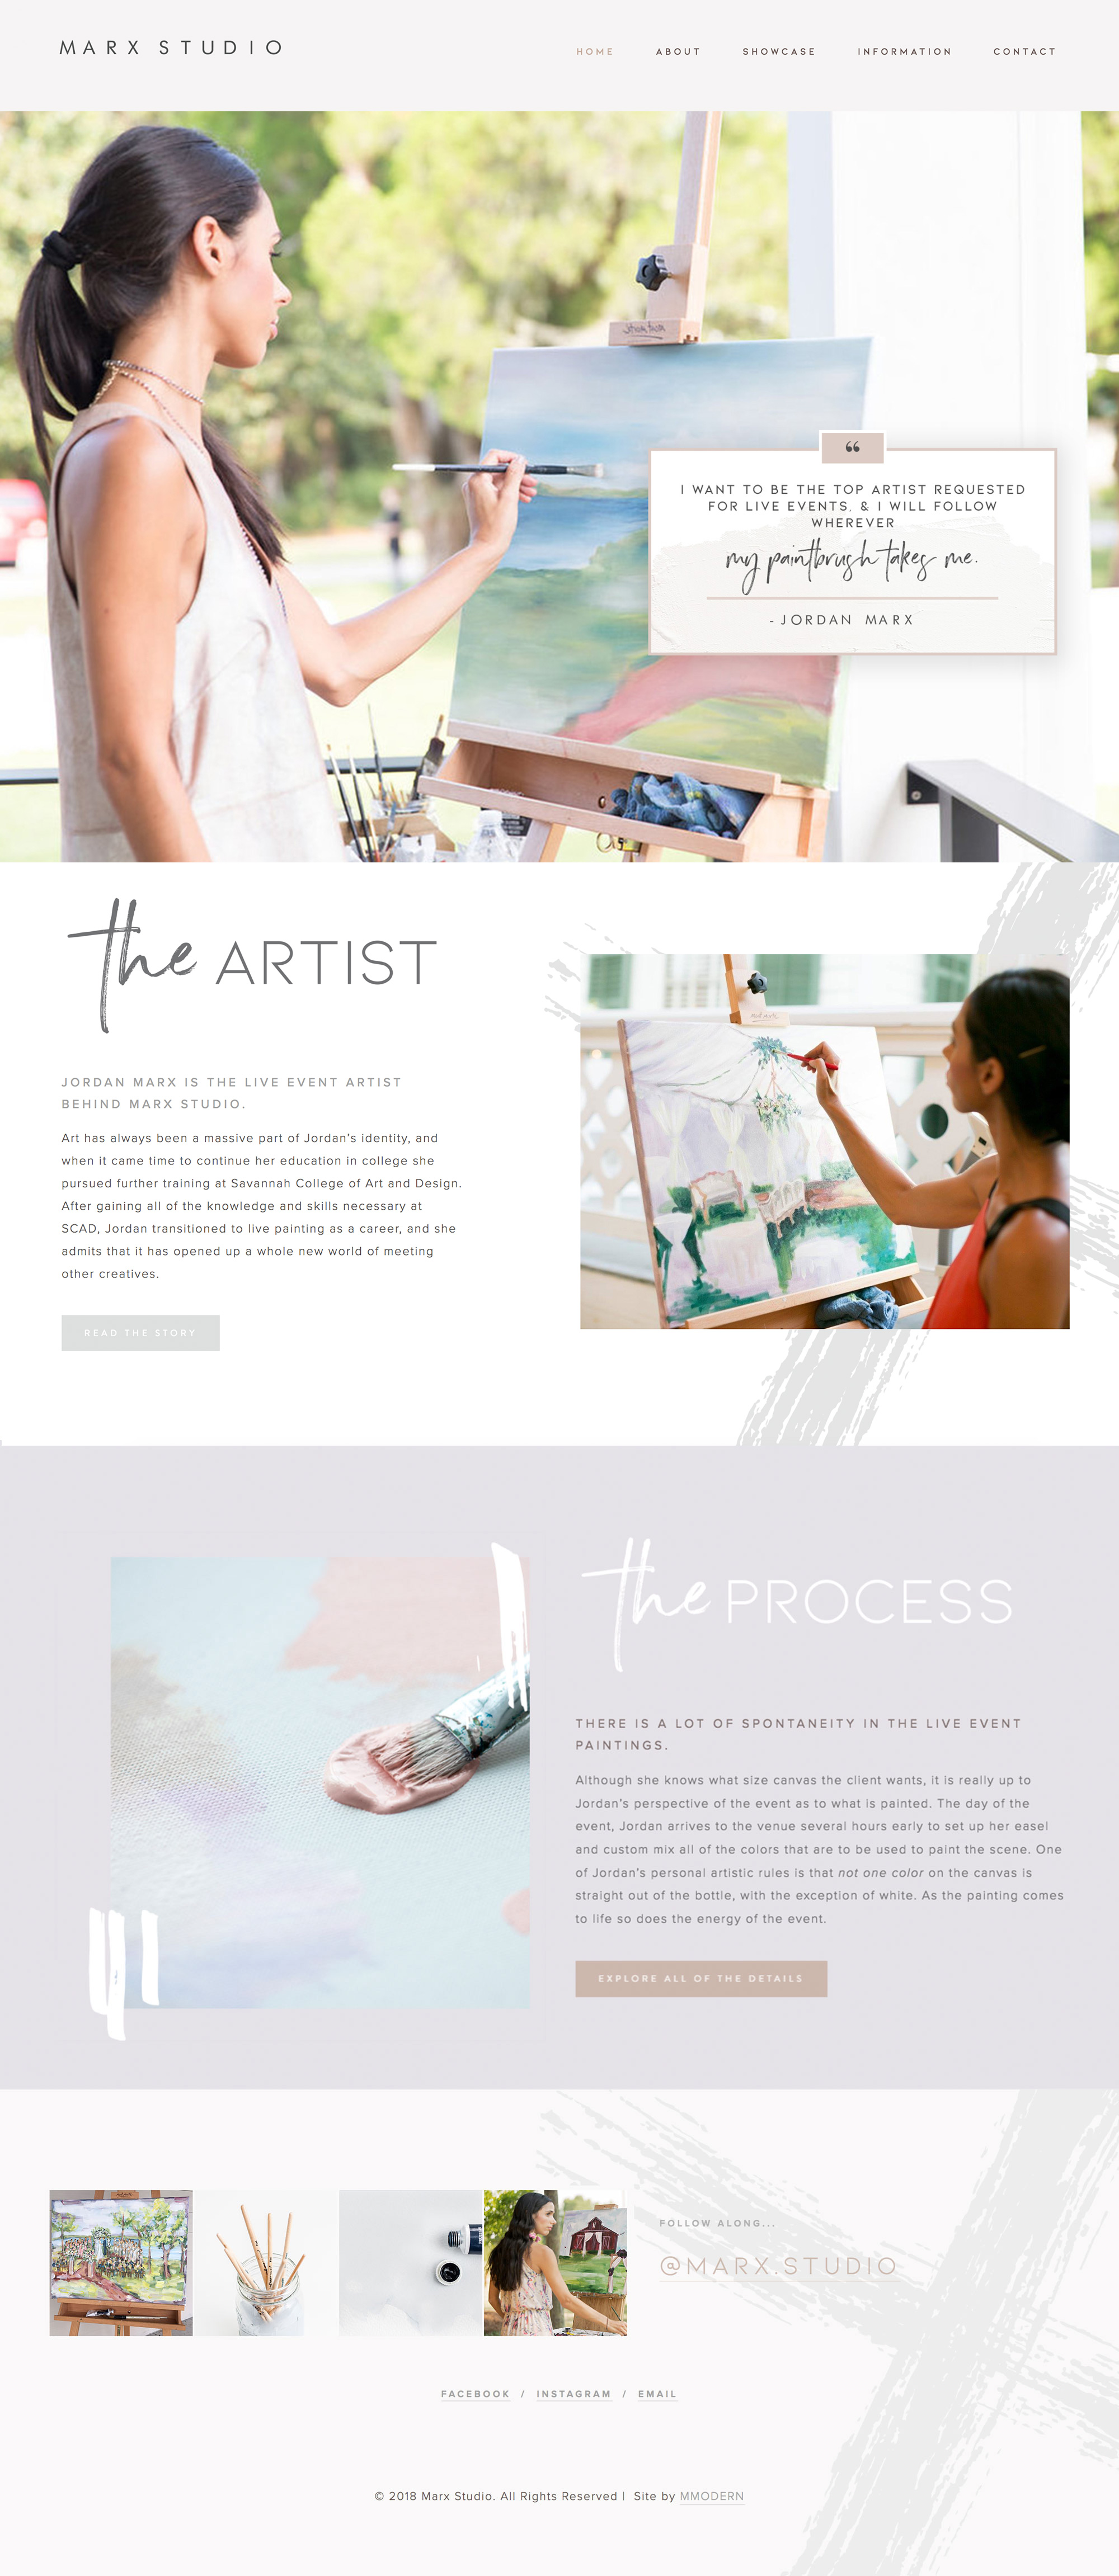 marx-studio-full.jpg